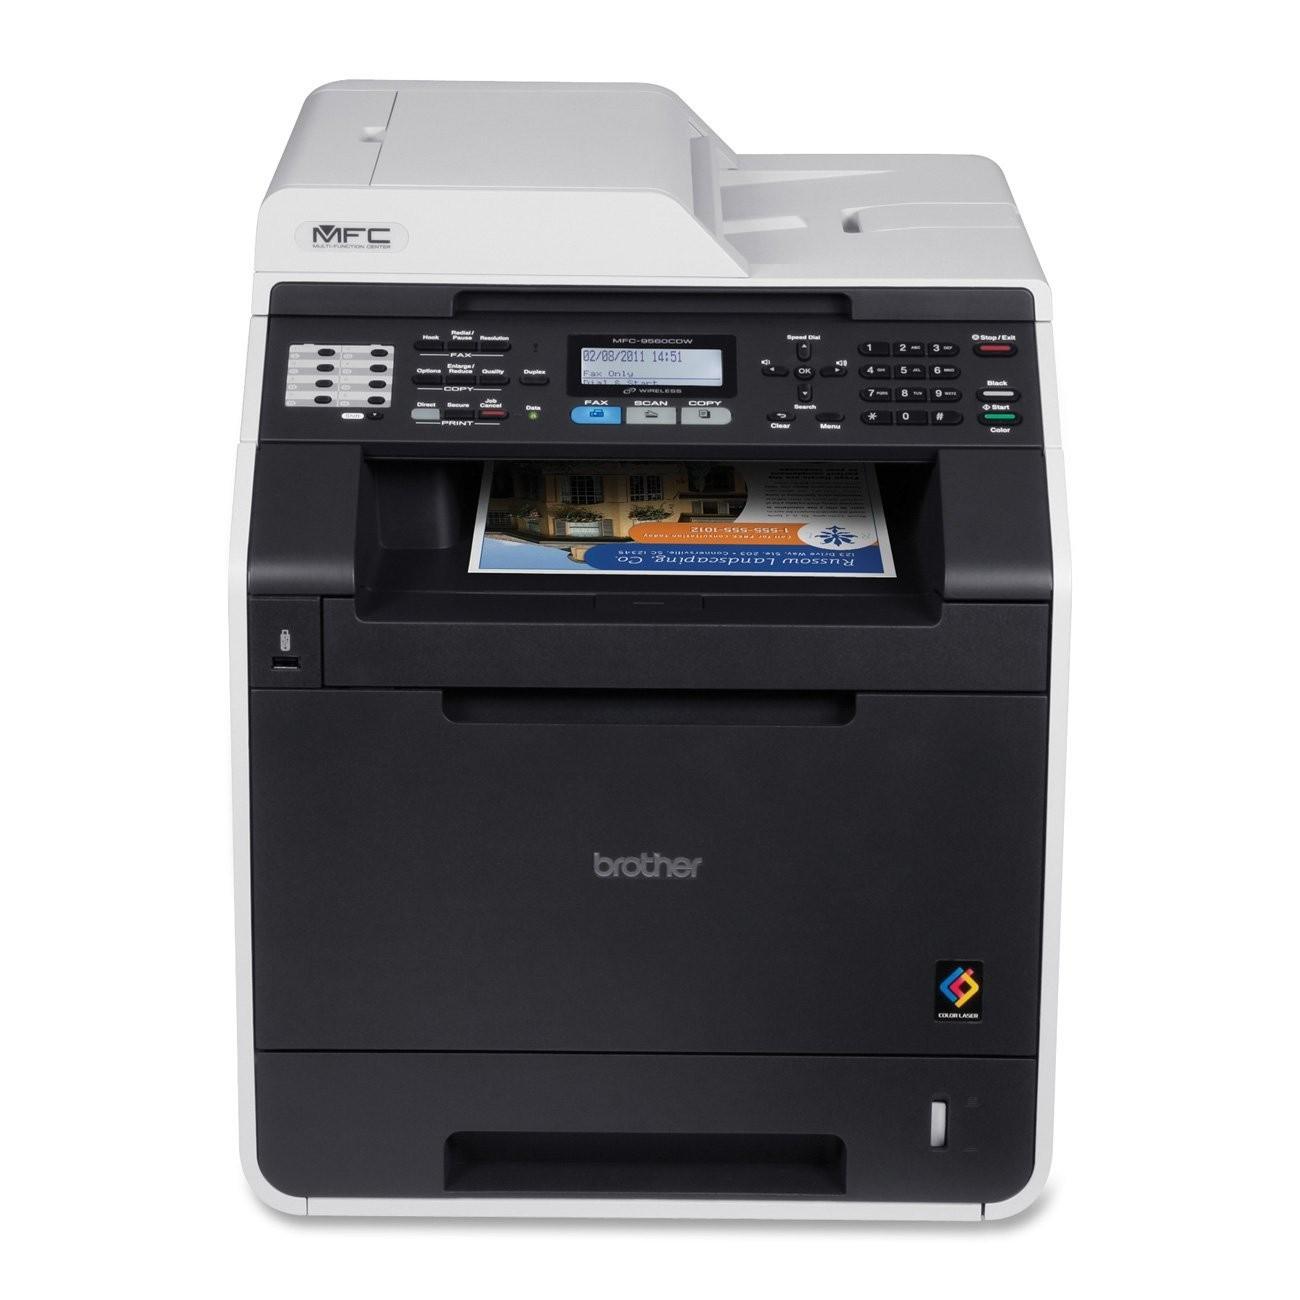 Принтер Brother MFC-9560CDW